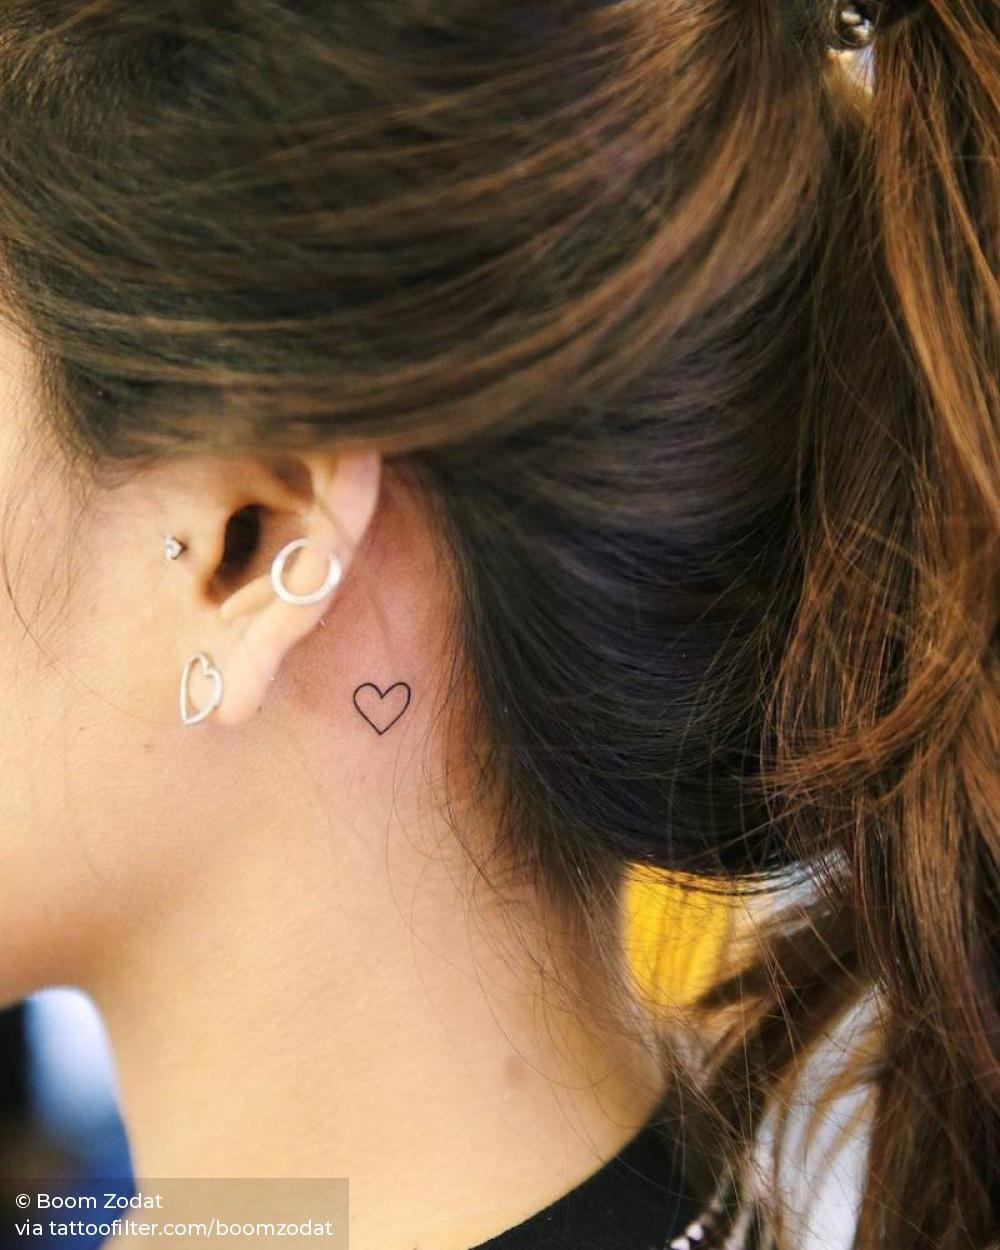 Minimalist Heart Behind The Left Ear Behind Ear Tattoo Small